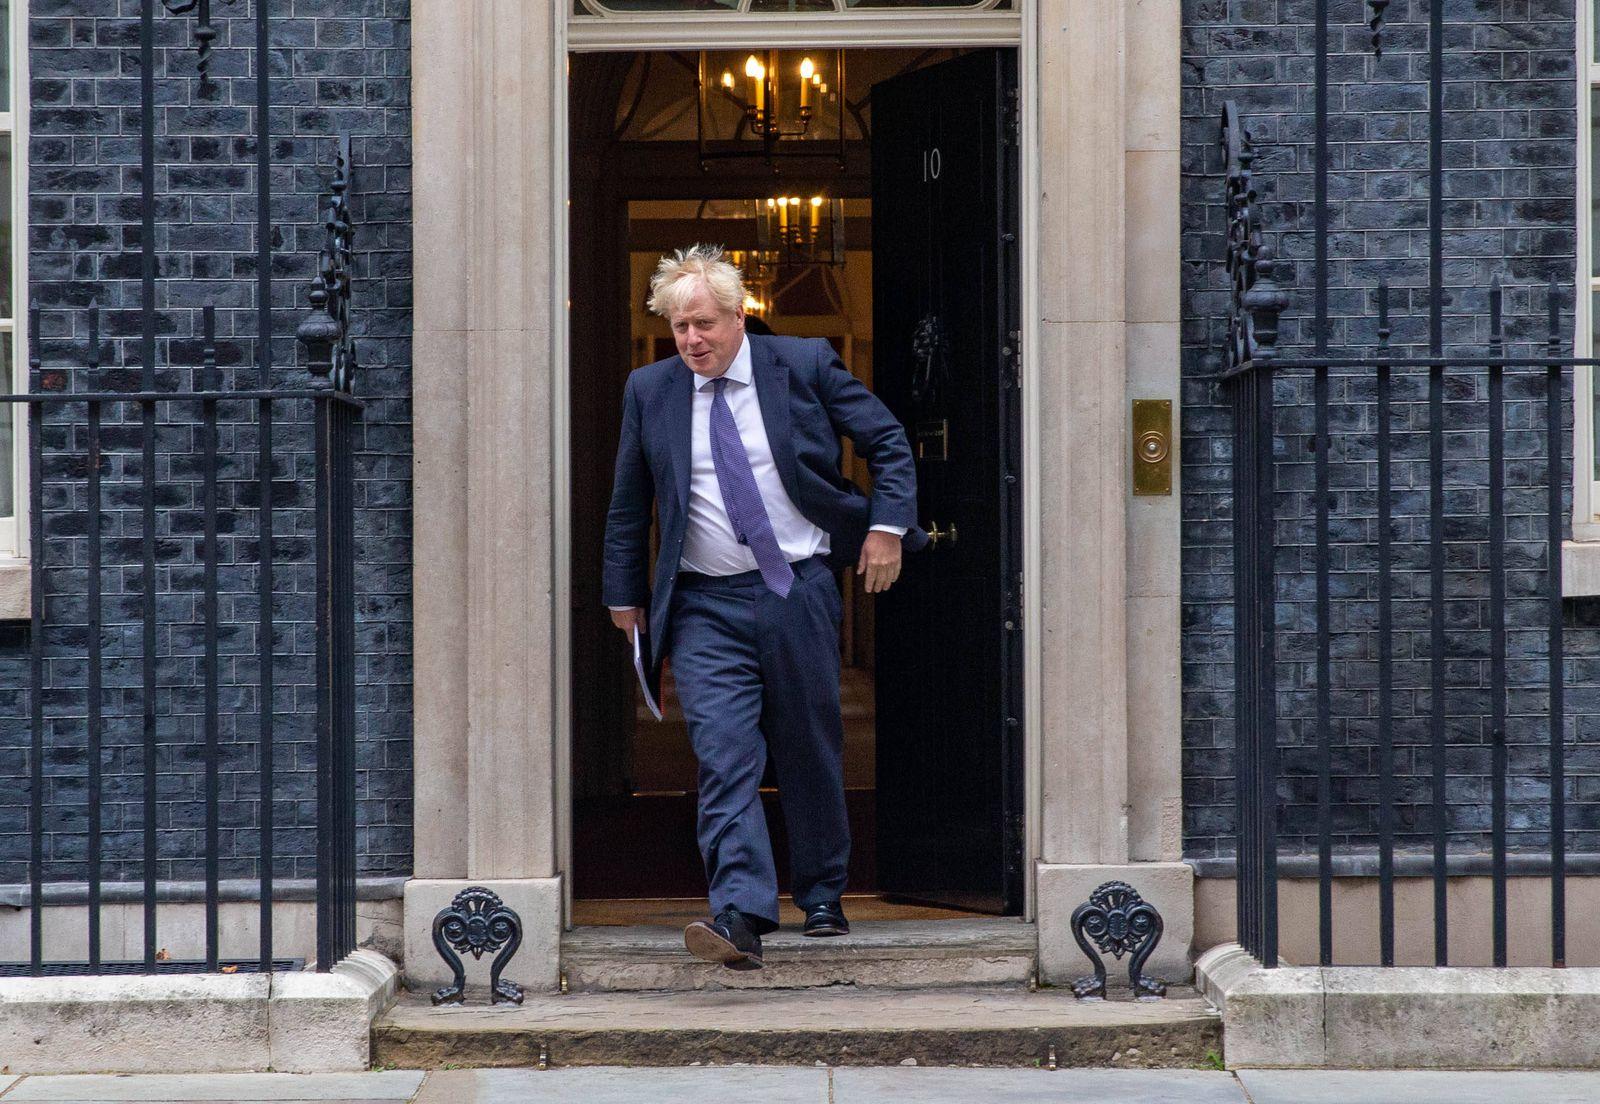 . 08/09/2020. London, United Kingdom. Boris Johnson, UK Prime Minister, leaves 10 Downing Street. Cabinet meeting. Downi